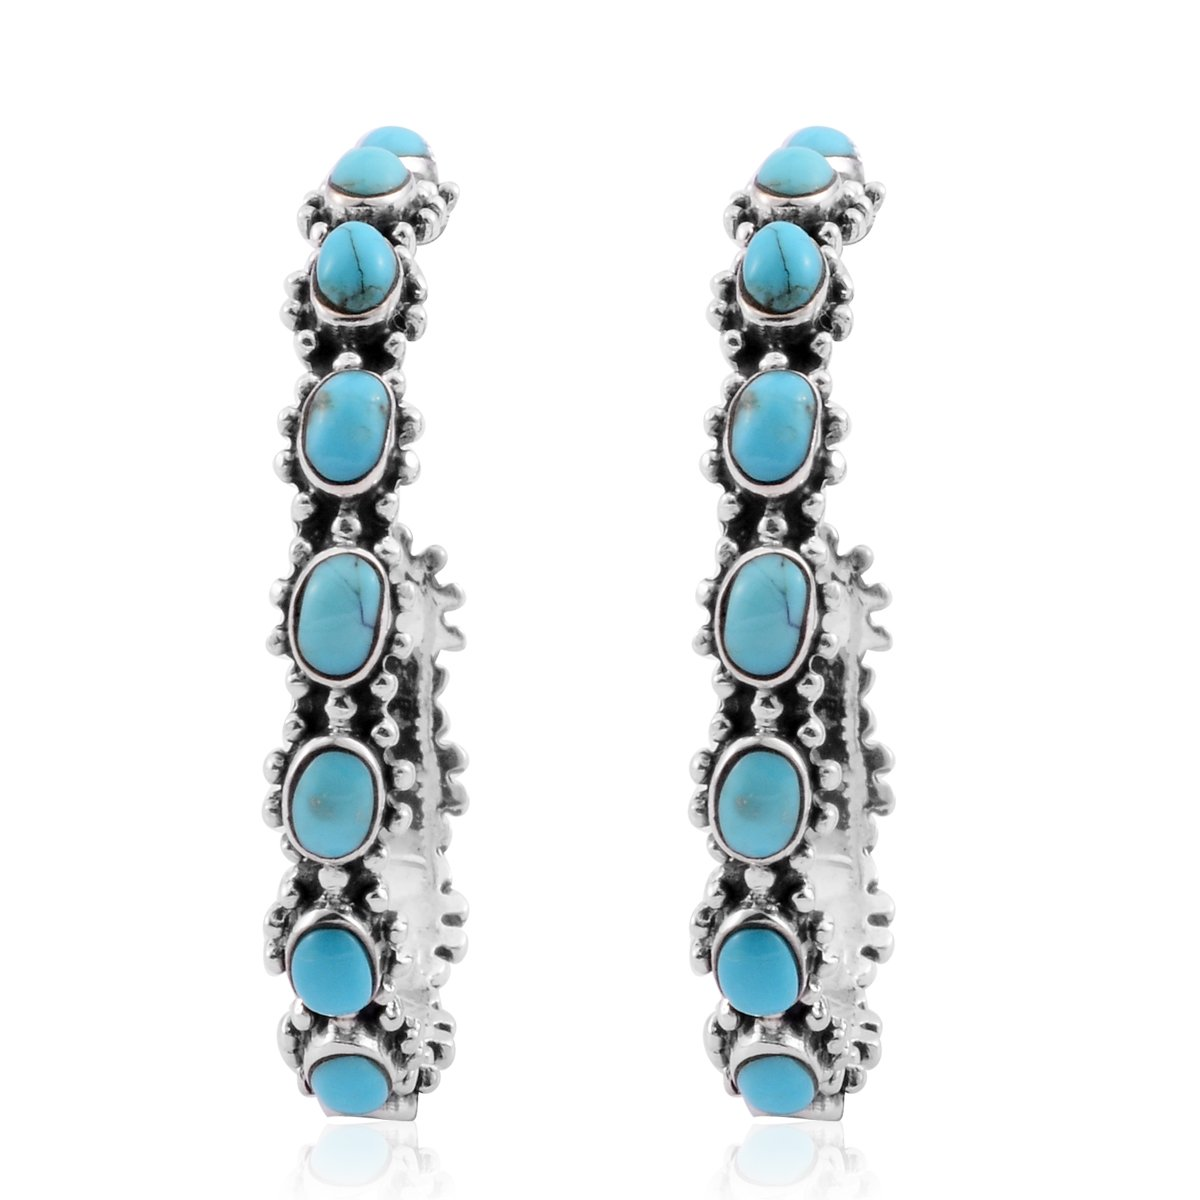 Santa Fe Style Turquoise 925 Sterling Silver Hoop Fashion Earrings For Women